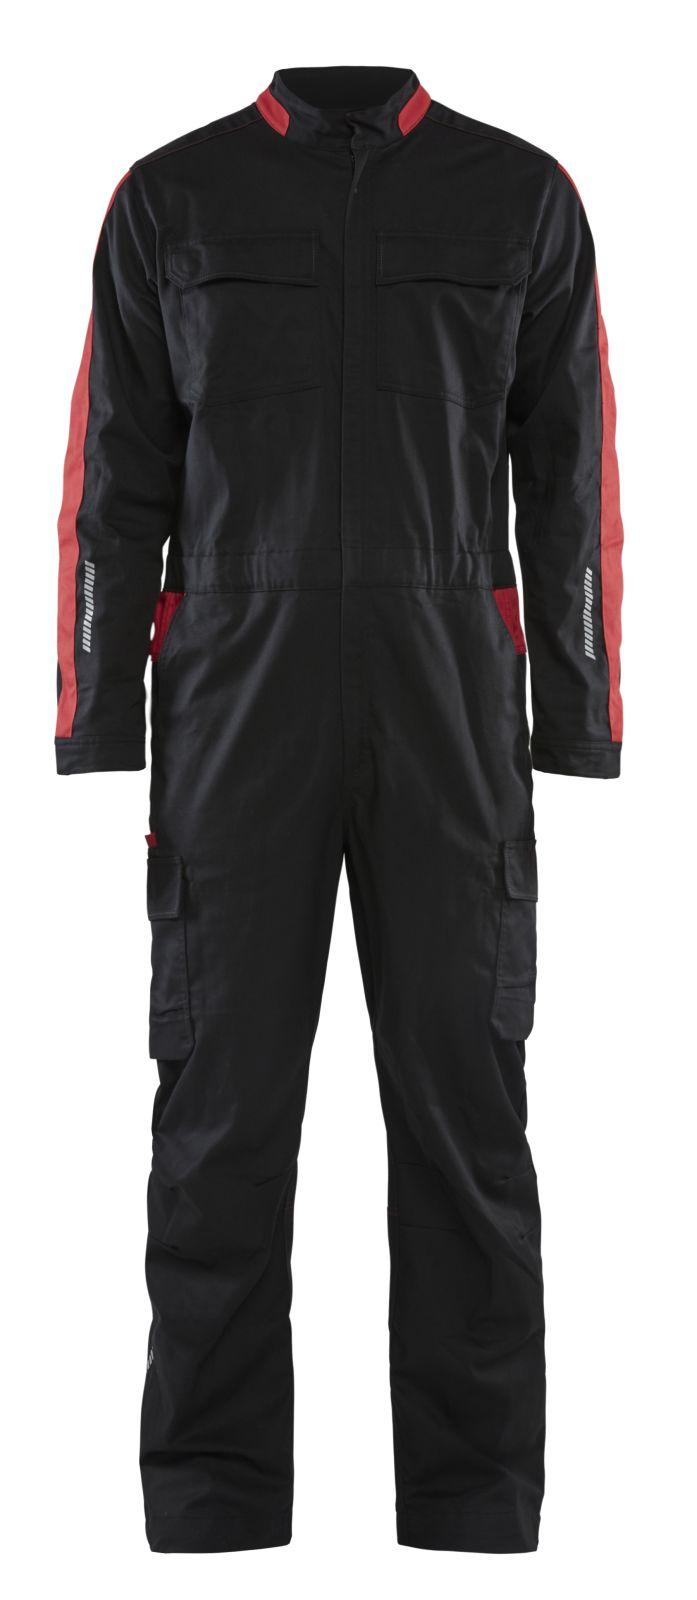 Blaklader Overalls 61441832 zwart-rood(9956)